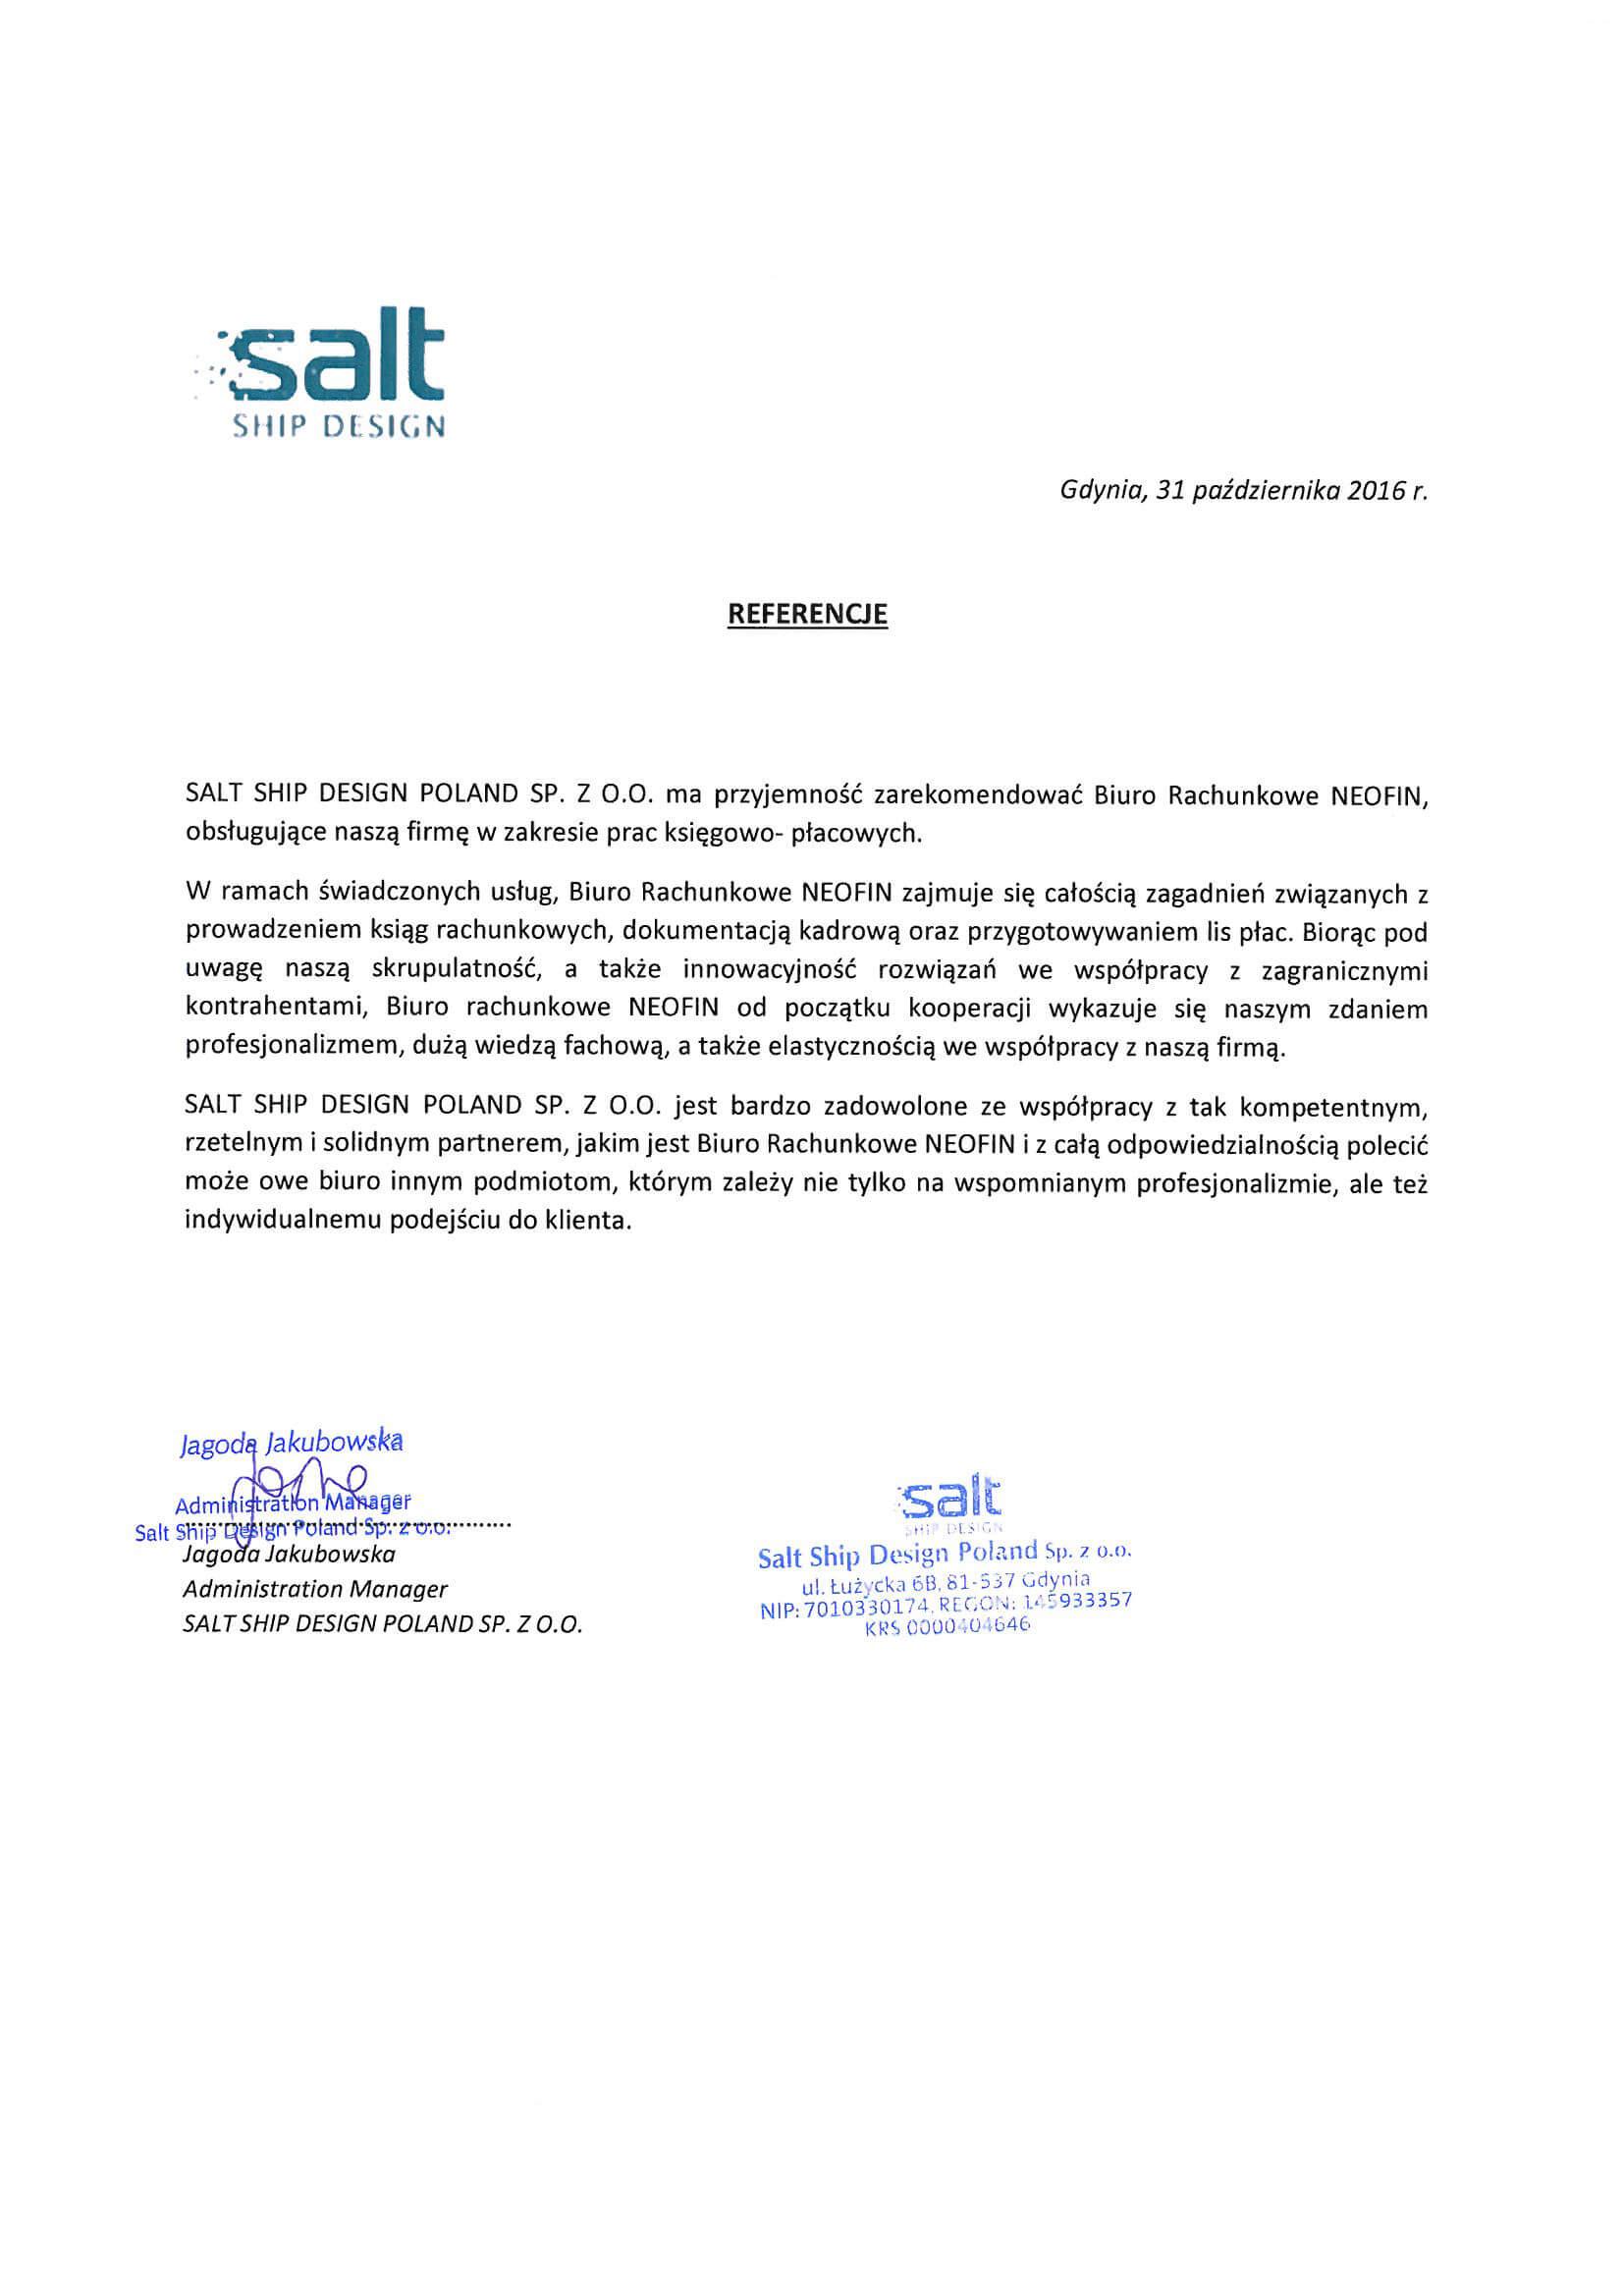 Referencje dla Neofin od Salt Ship Design Poland Sp. z o. o.